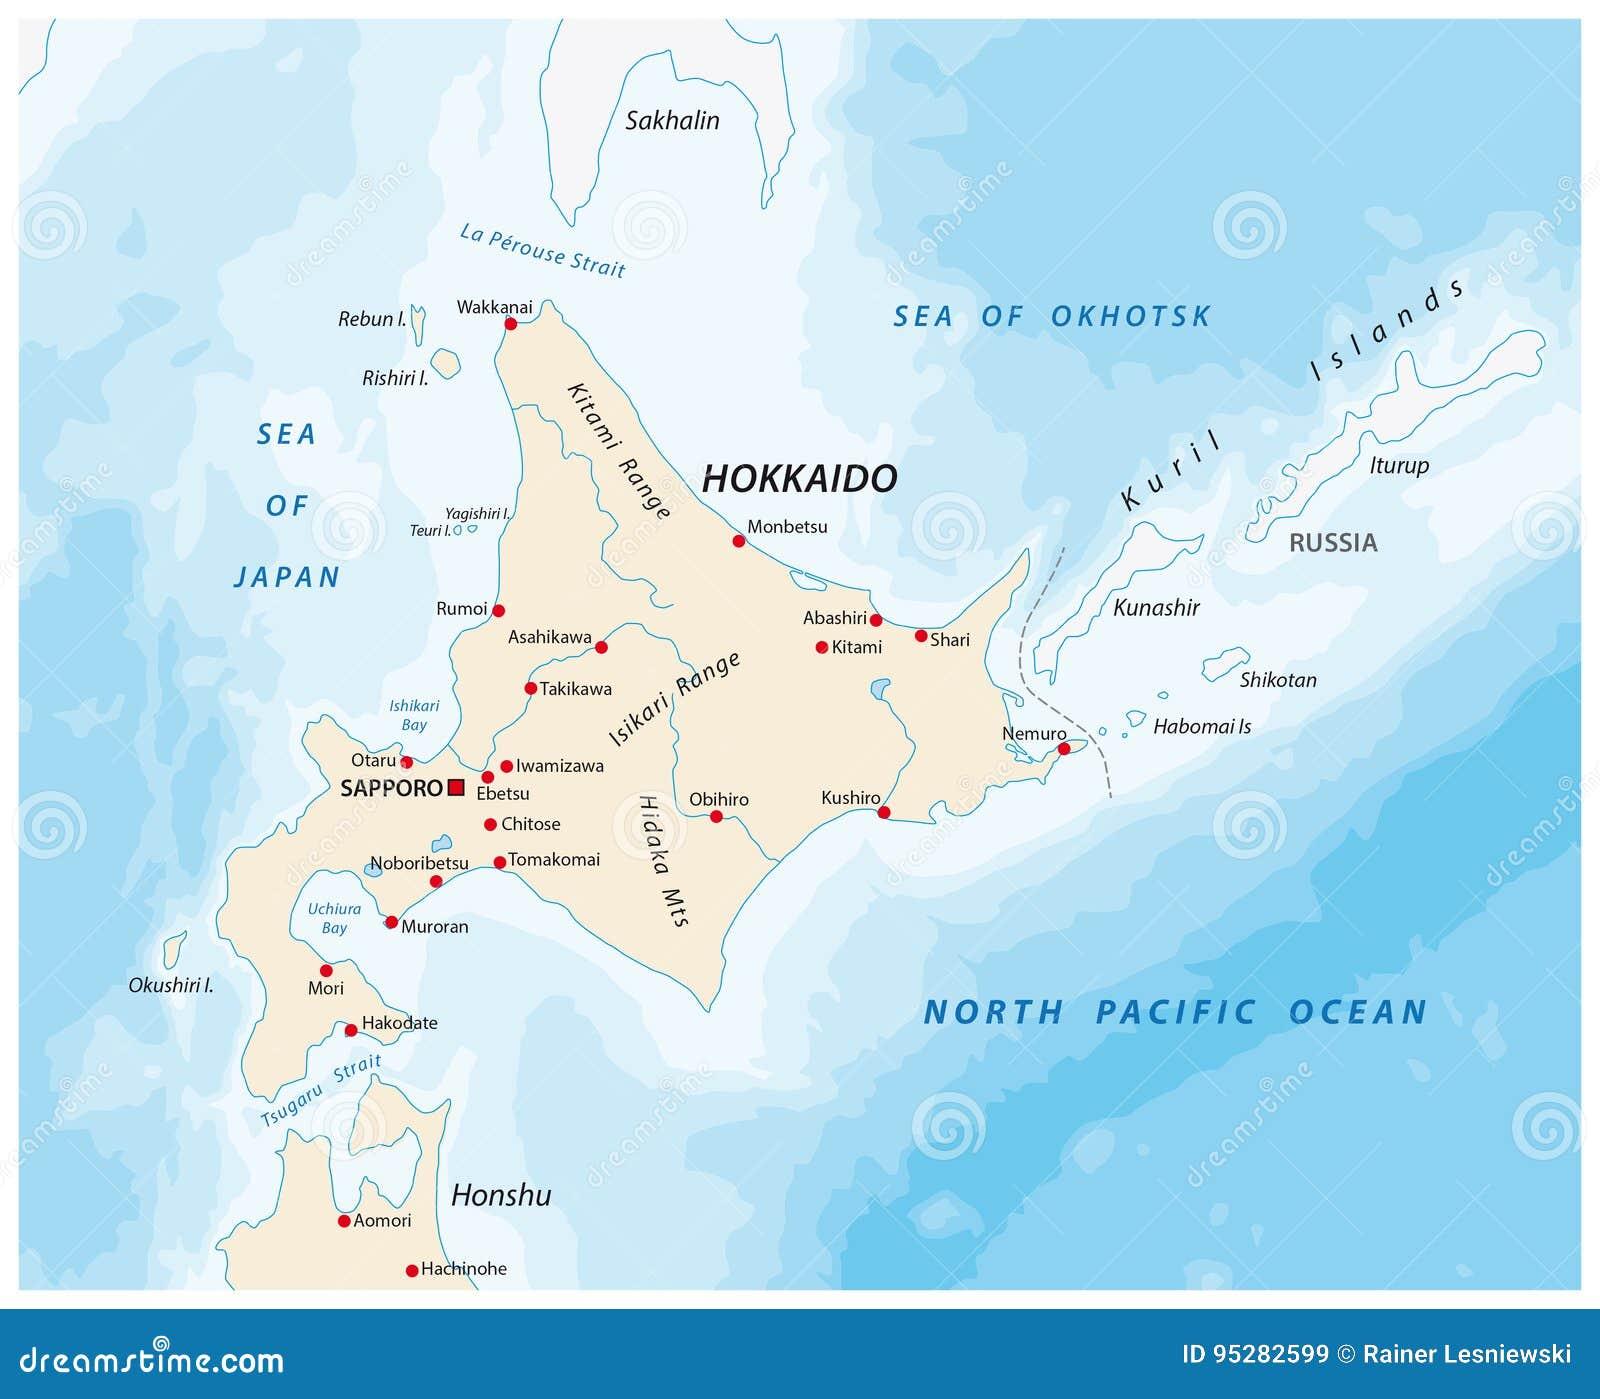 A Map Of The North Japanese Island Hokkaido Stock Vector ... Sea Of Okhotsk Japan Map on shikoku japan map, hokkaido japan map, indonesia japan map, kuril islands japan map, alaska japan map, tsugaru strait japan map, pacific ocean japan map, nansei japan map, japan korea strait map, tokyo japan map, akita japan map, sakhalin japan map, russia japan map, narita japan map, mount fuji japan map, iwo jima island japan map, kyoto japan map, japan japanese alps map, okinawa japan map, china japan map,